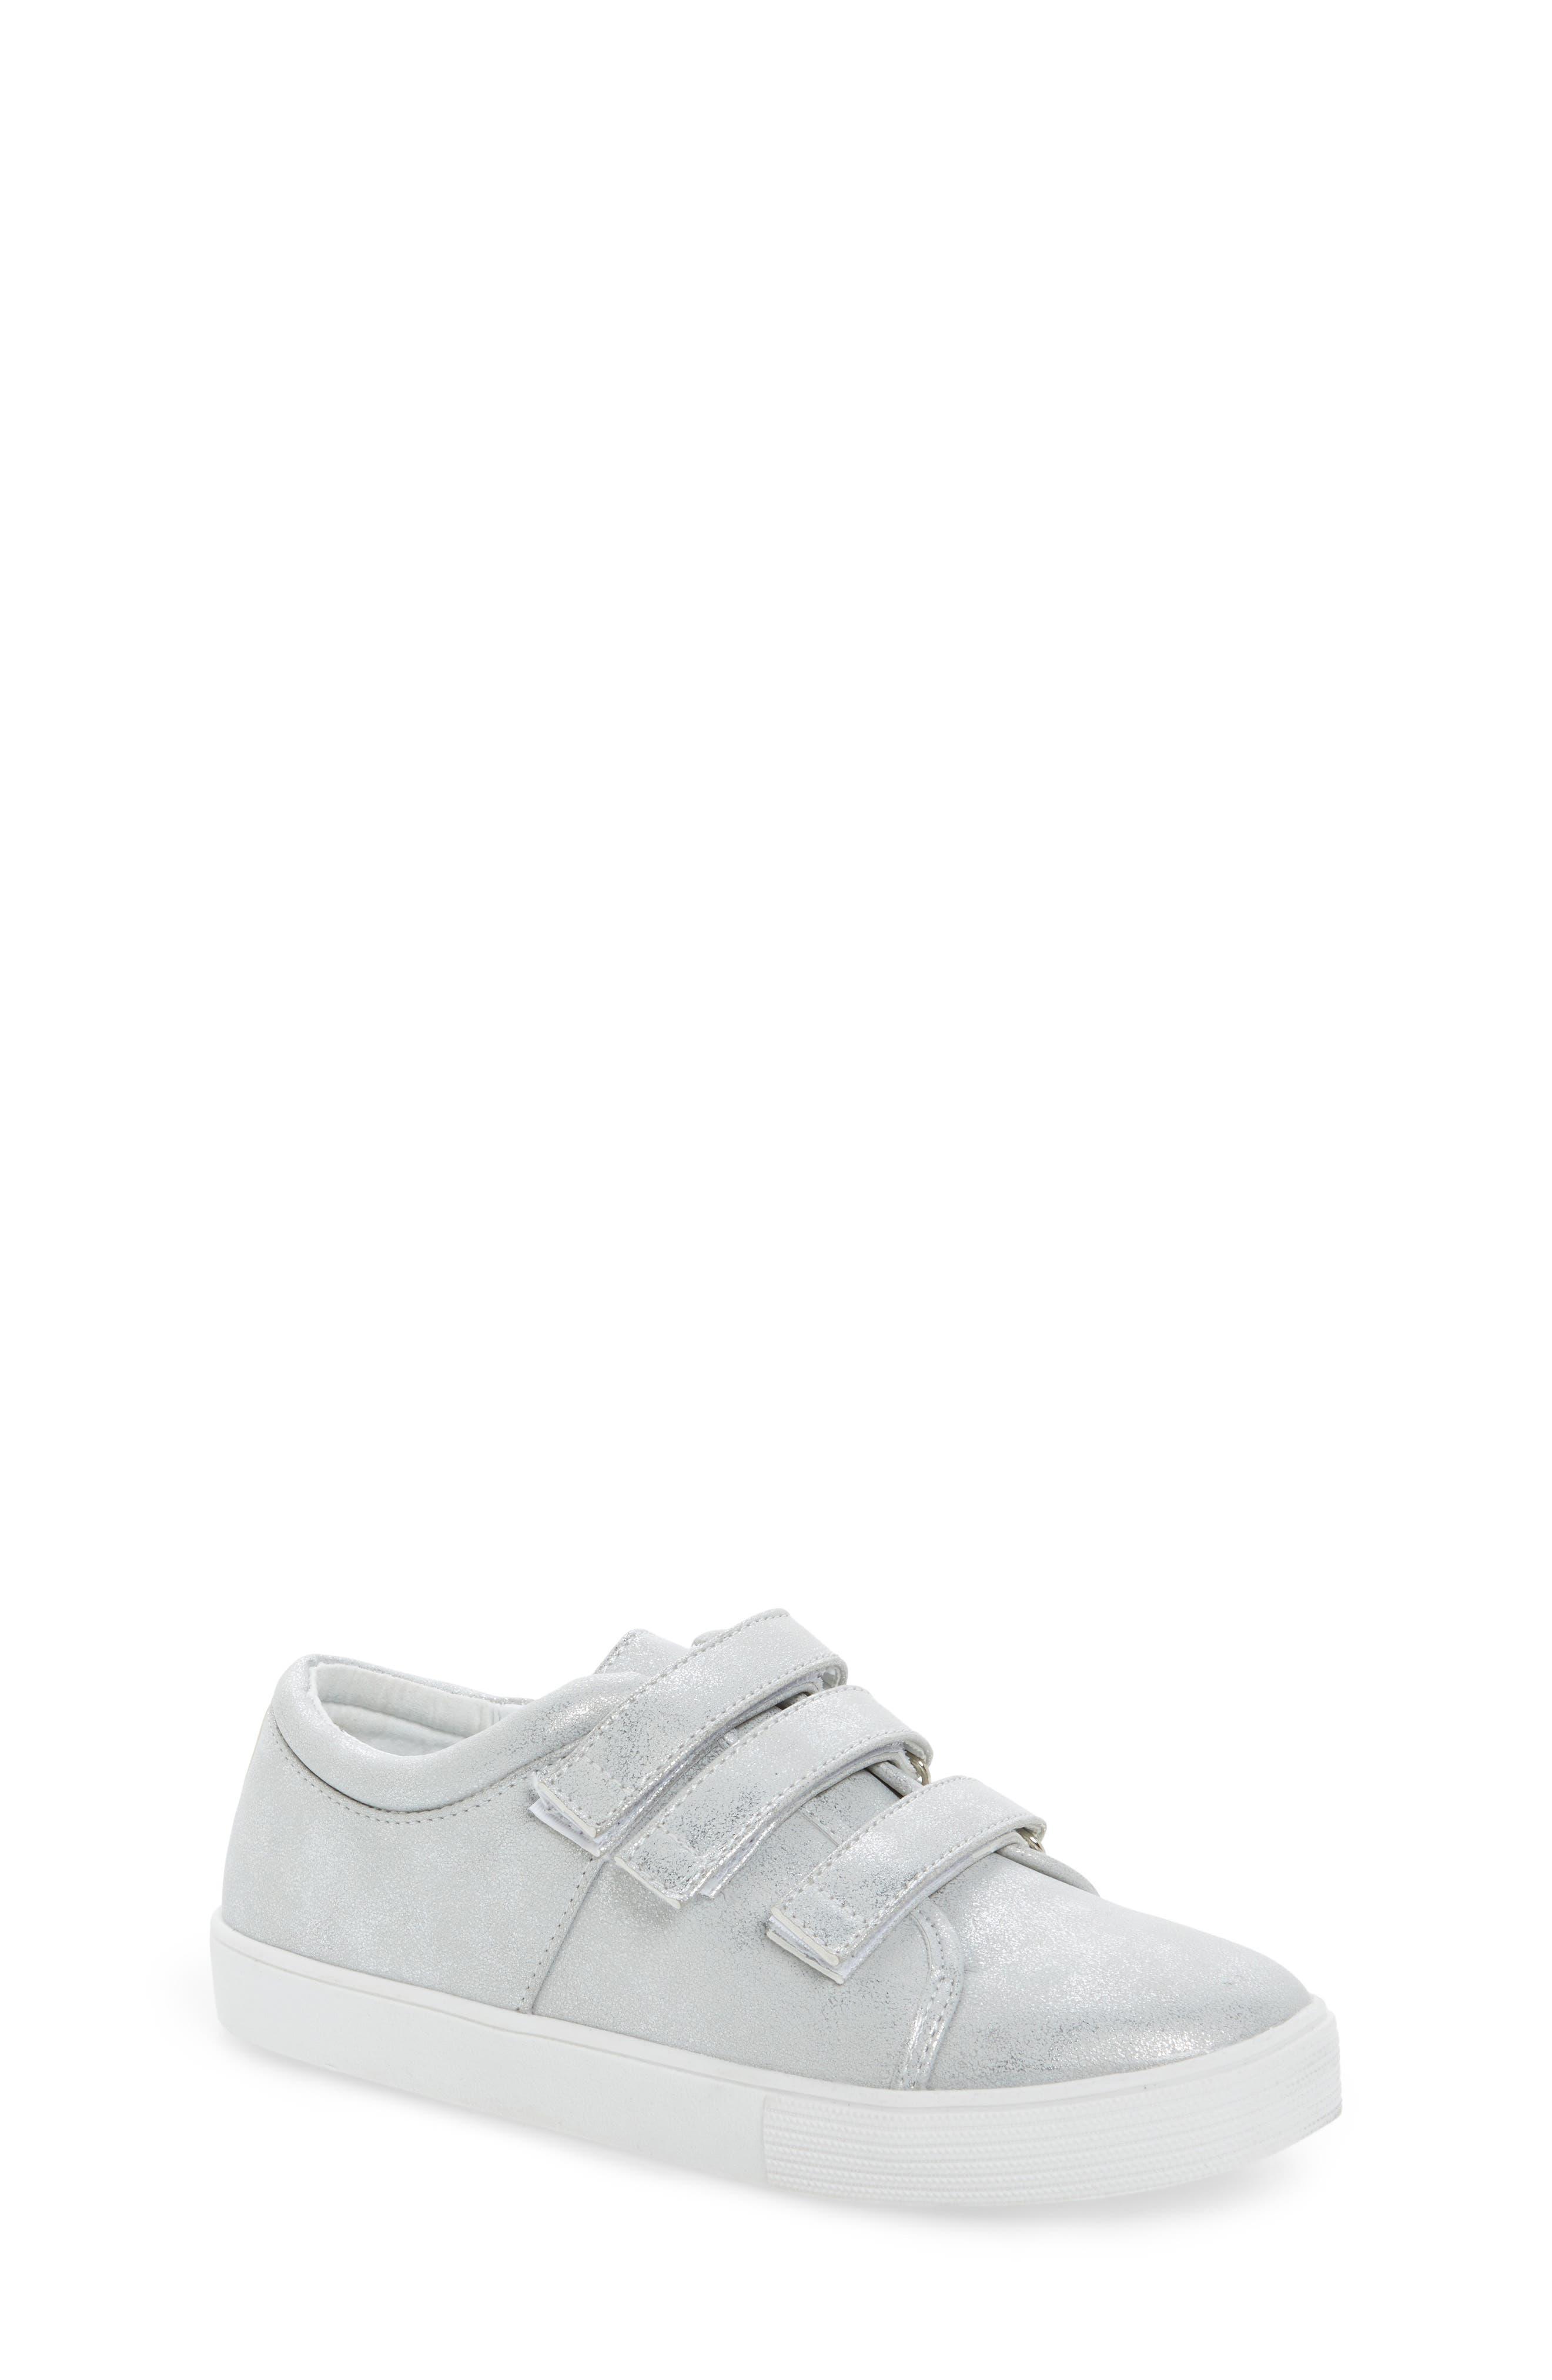 Main Image - Kenneth Cole New York Kam Glitter Strap Sneaker (Toddler, Little Kid & Big Kid)